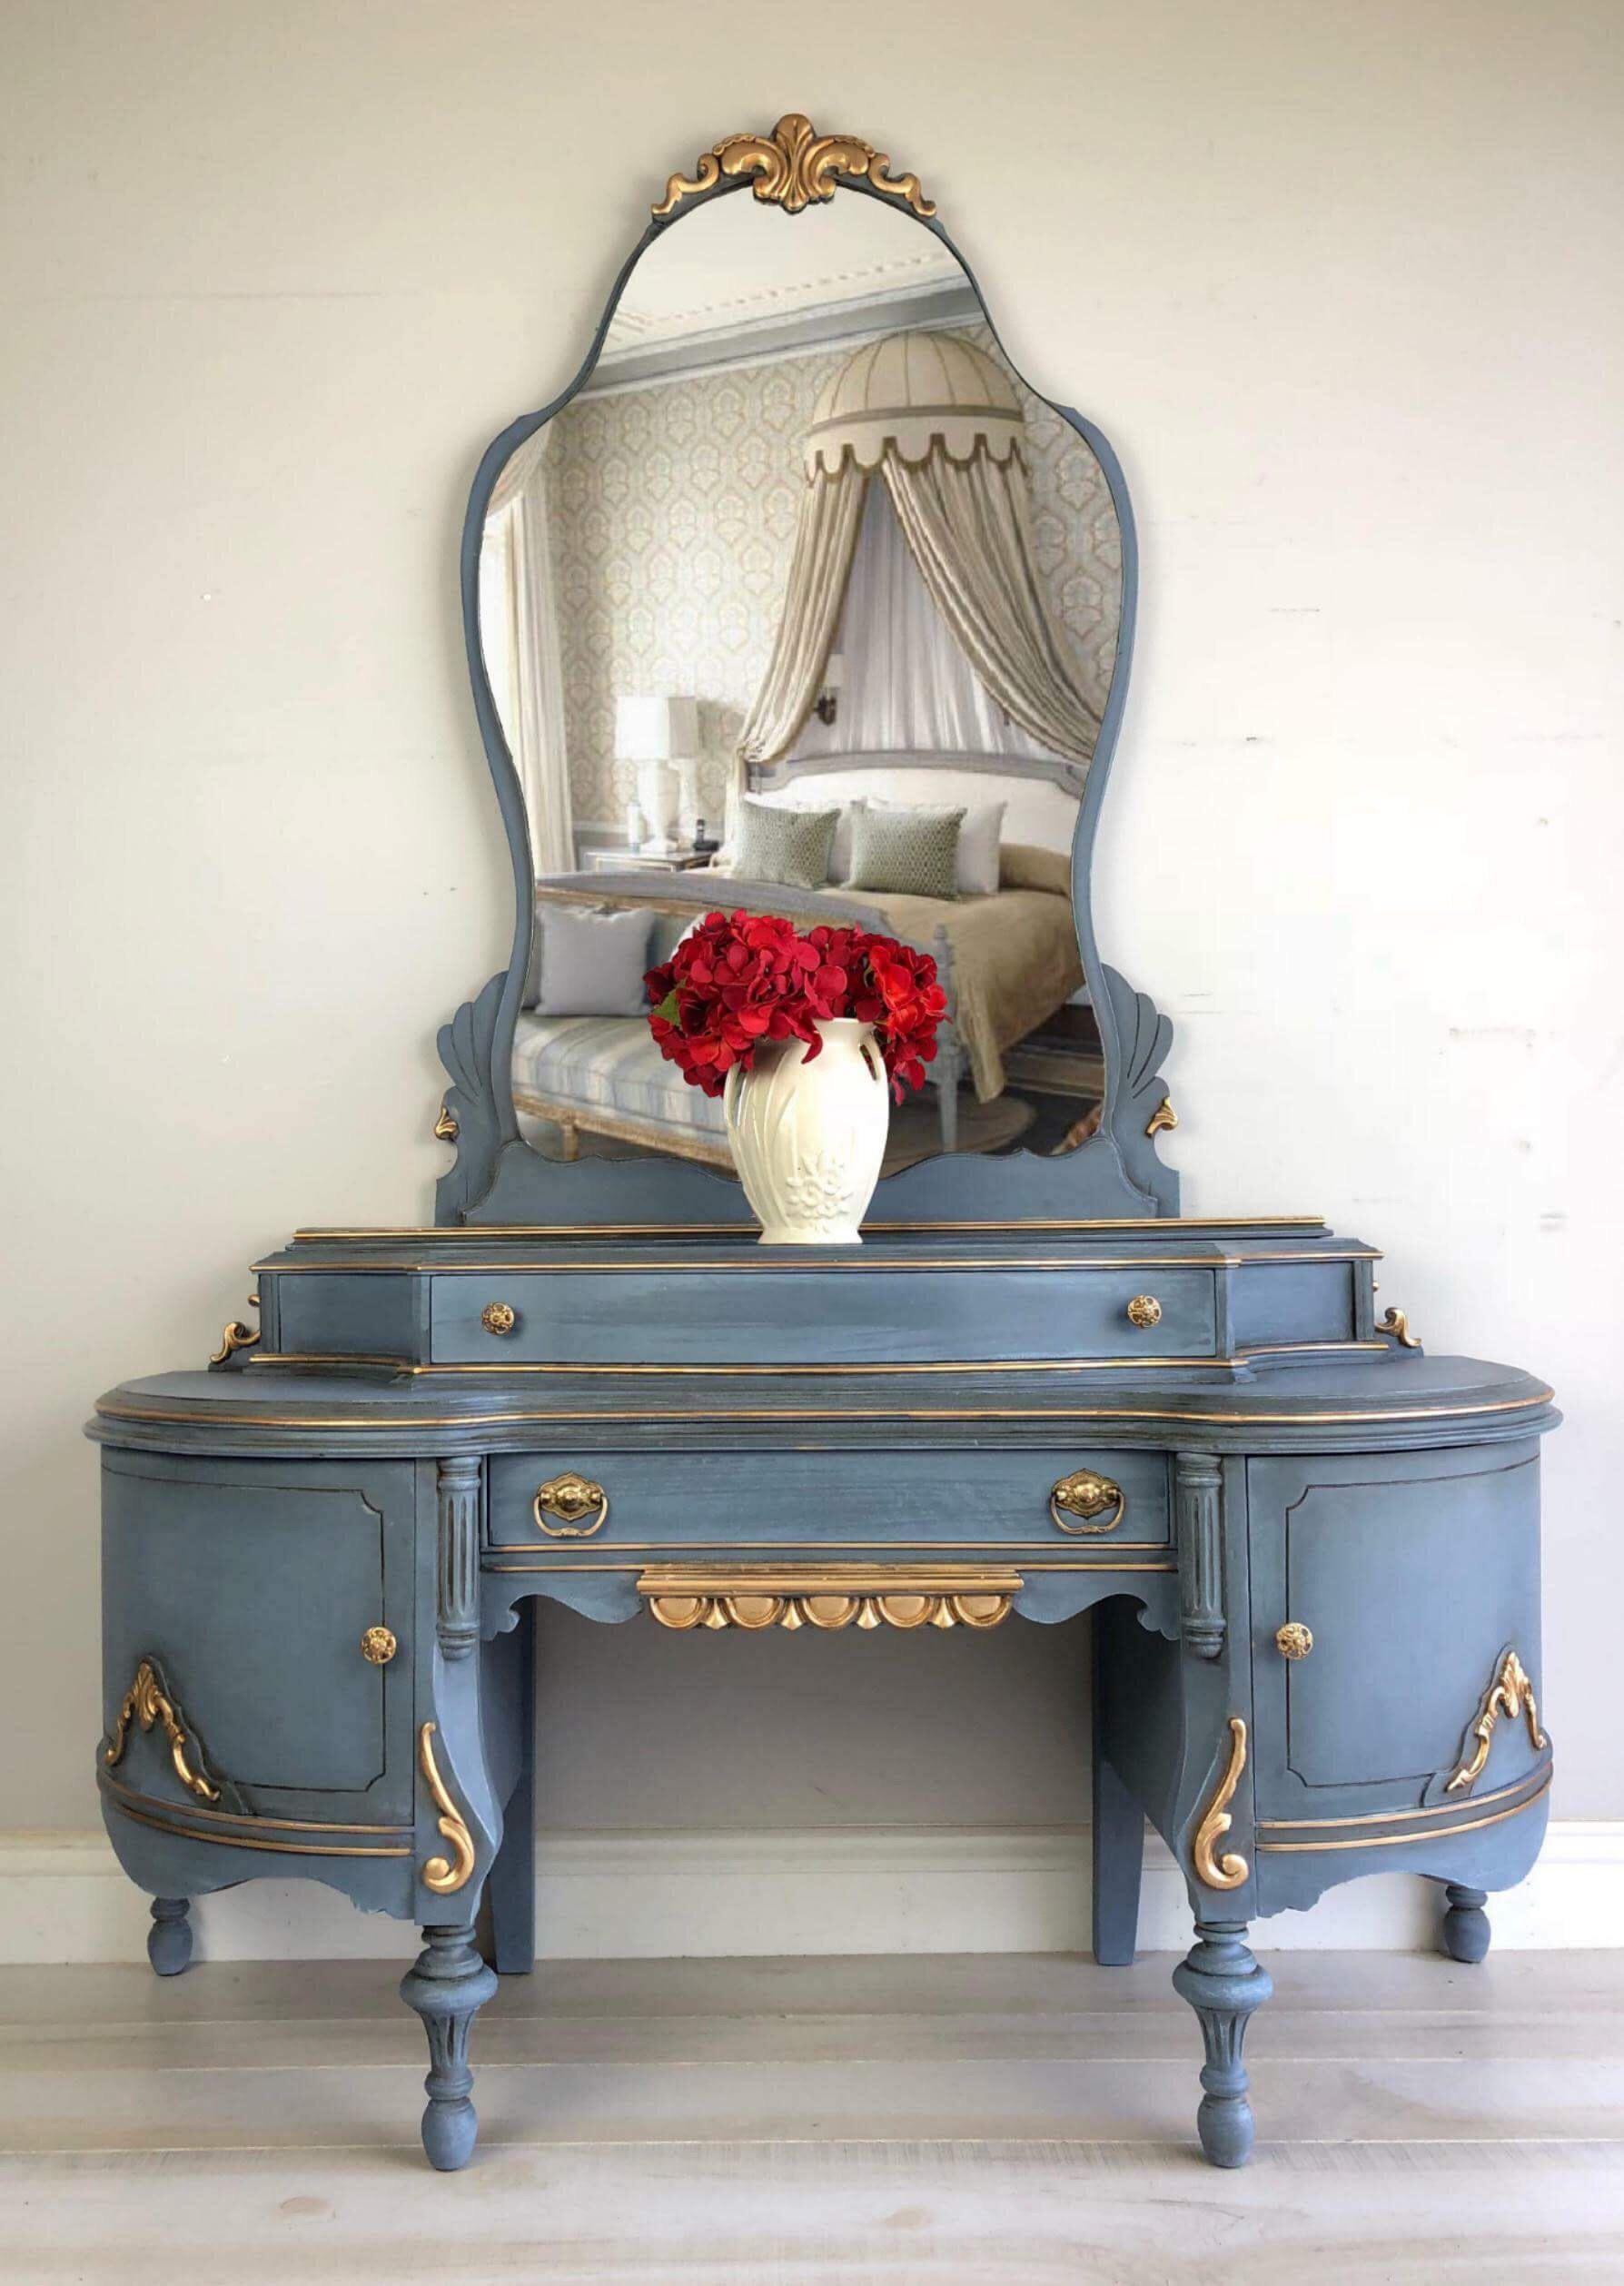 Painted furniture vintage vanity makeup mirror farmhouse